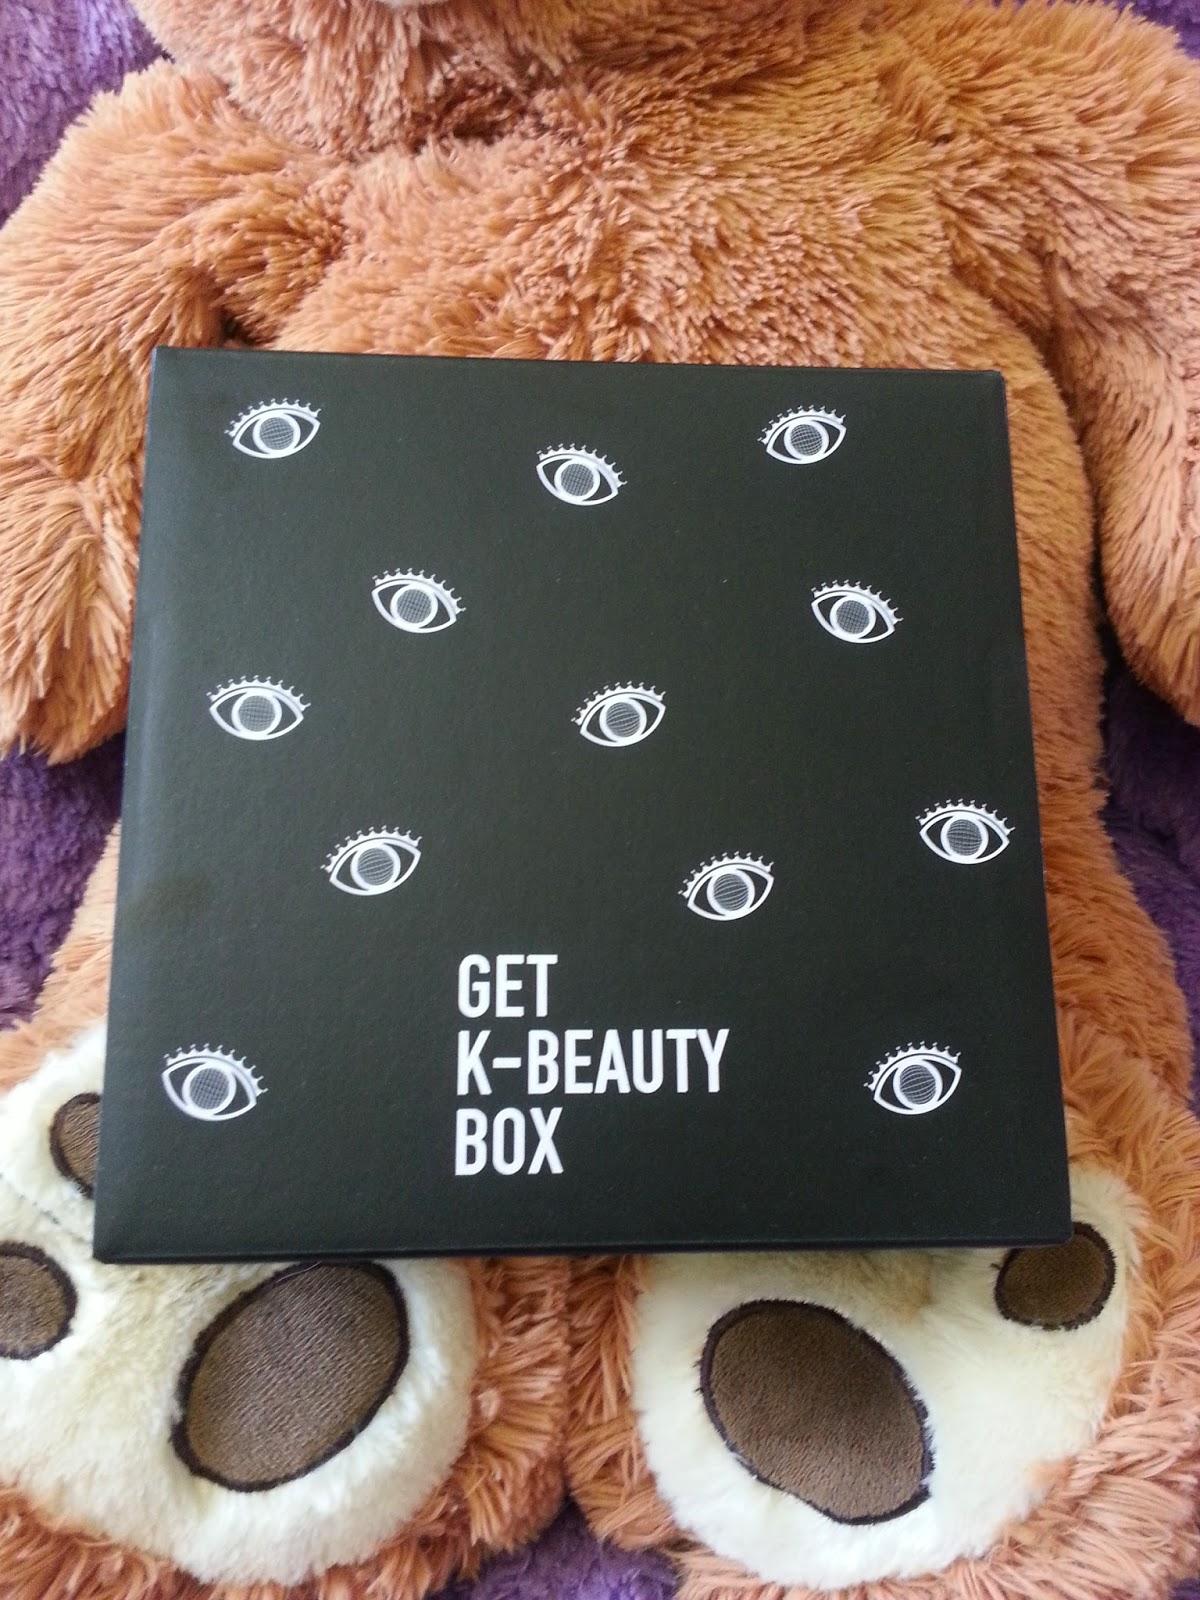 Get K-Beauty Box